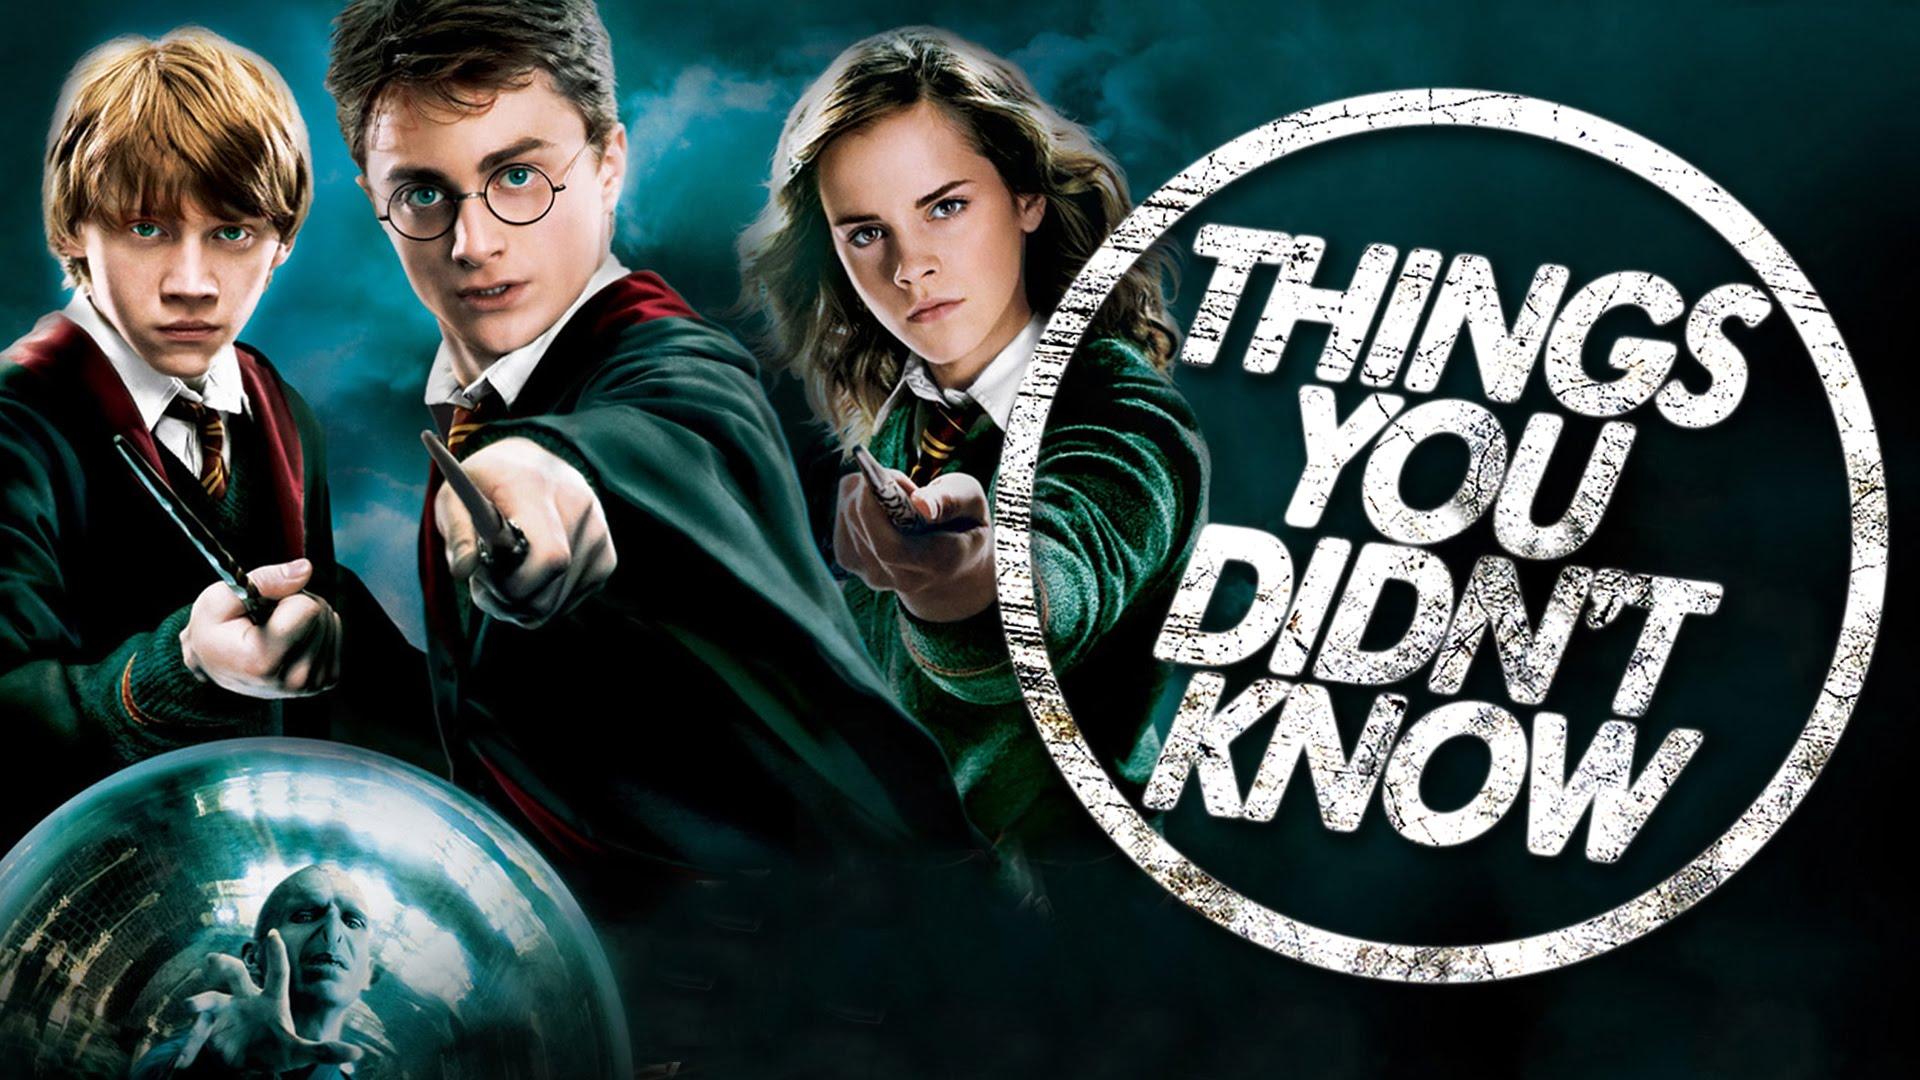 「關於《哈利波特》你可能不知道的 7 件事」- 7 Things You (Probably) Didn't Know about Harry Potter